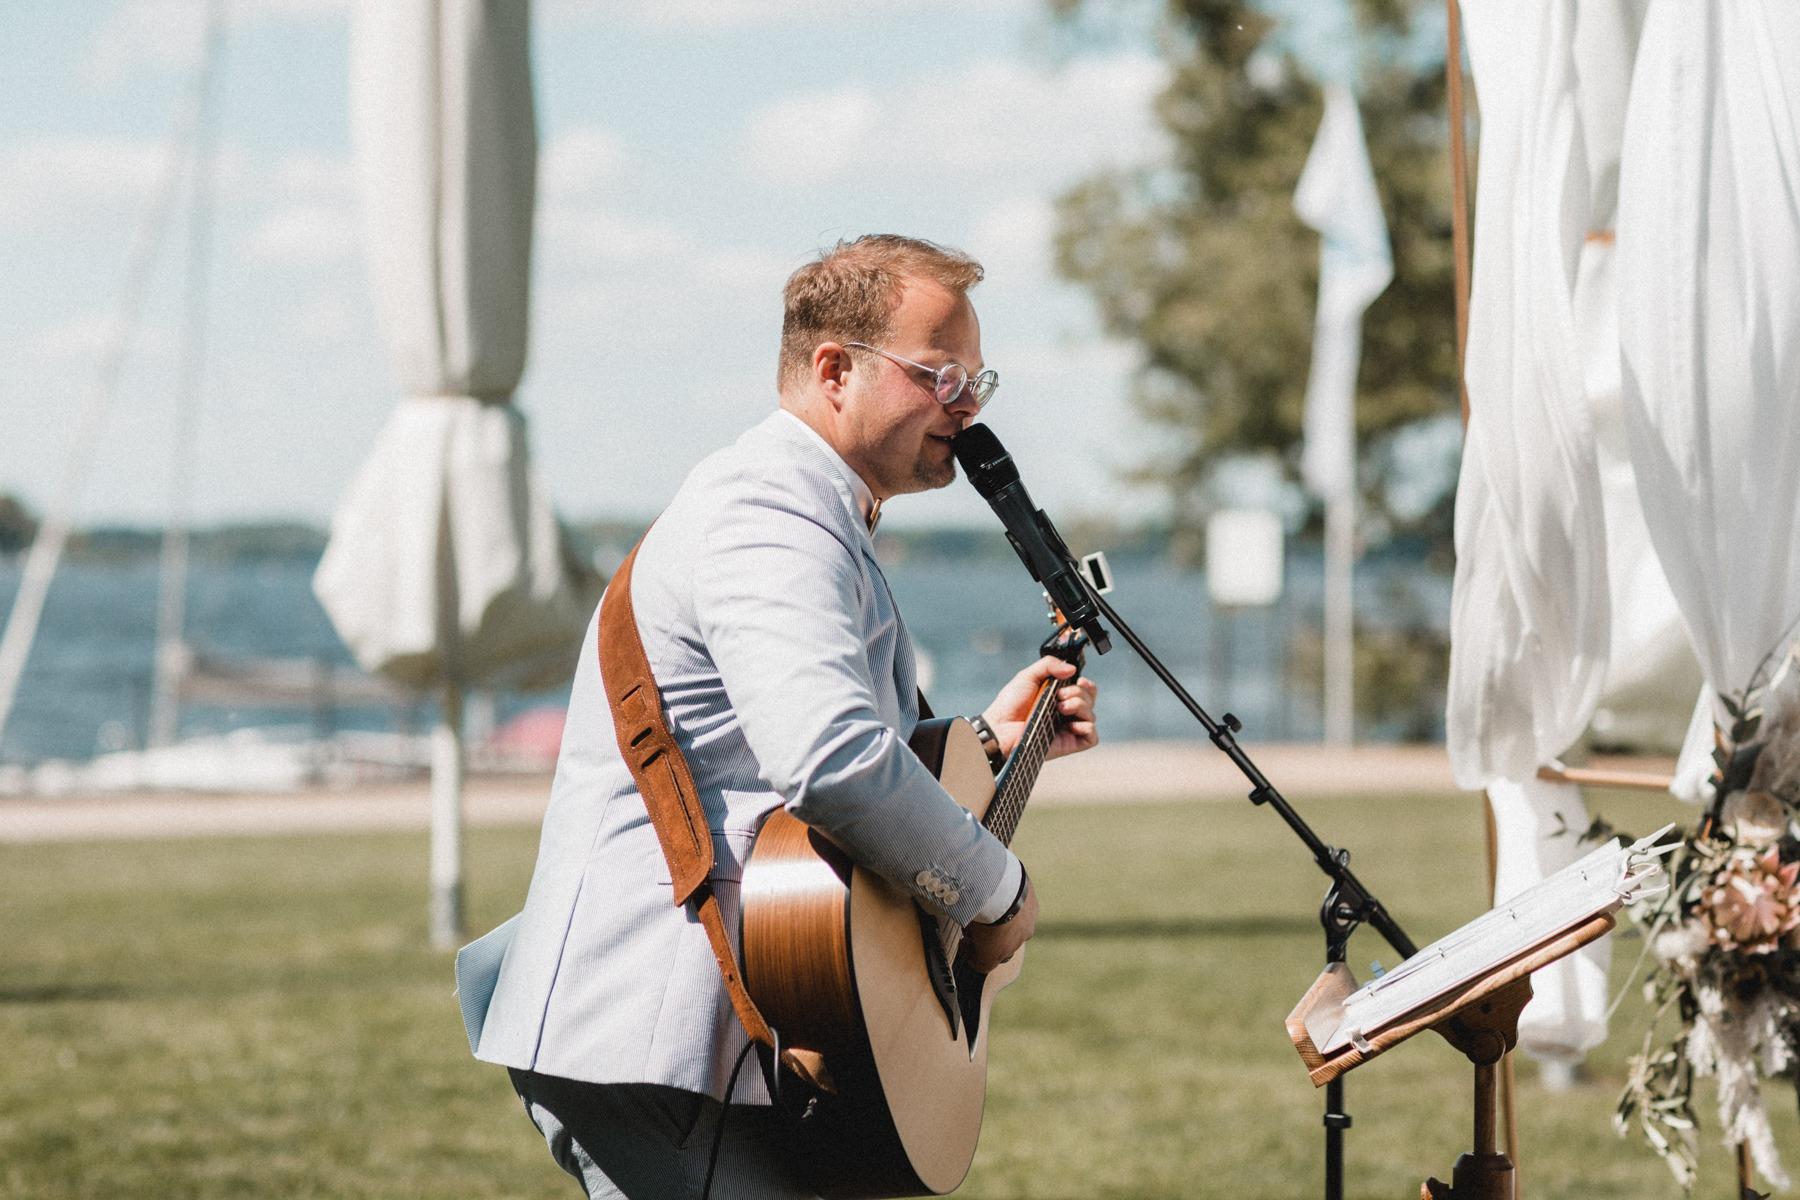 Unser Sänger Lukas Stifft an der Gitarre